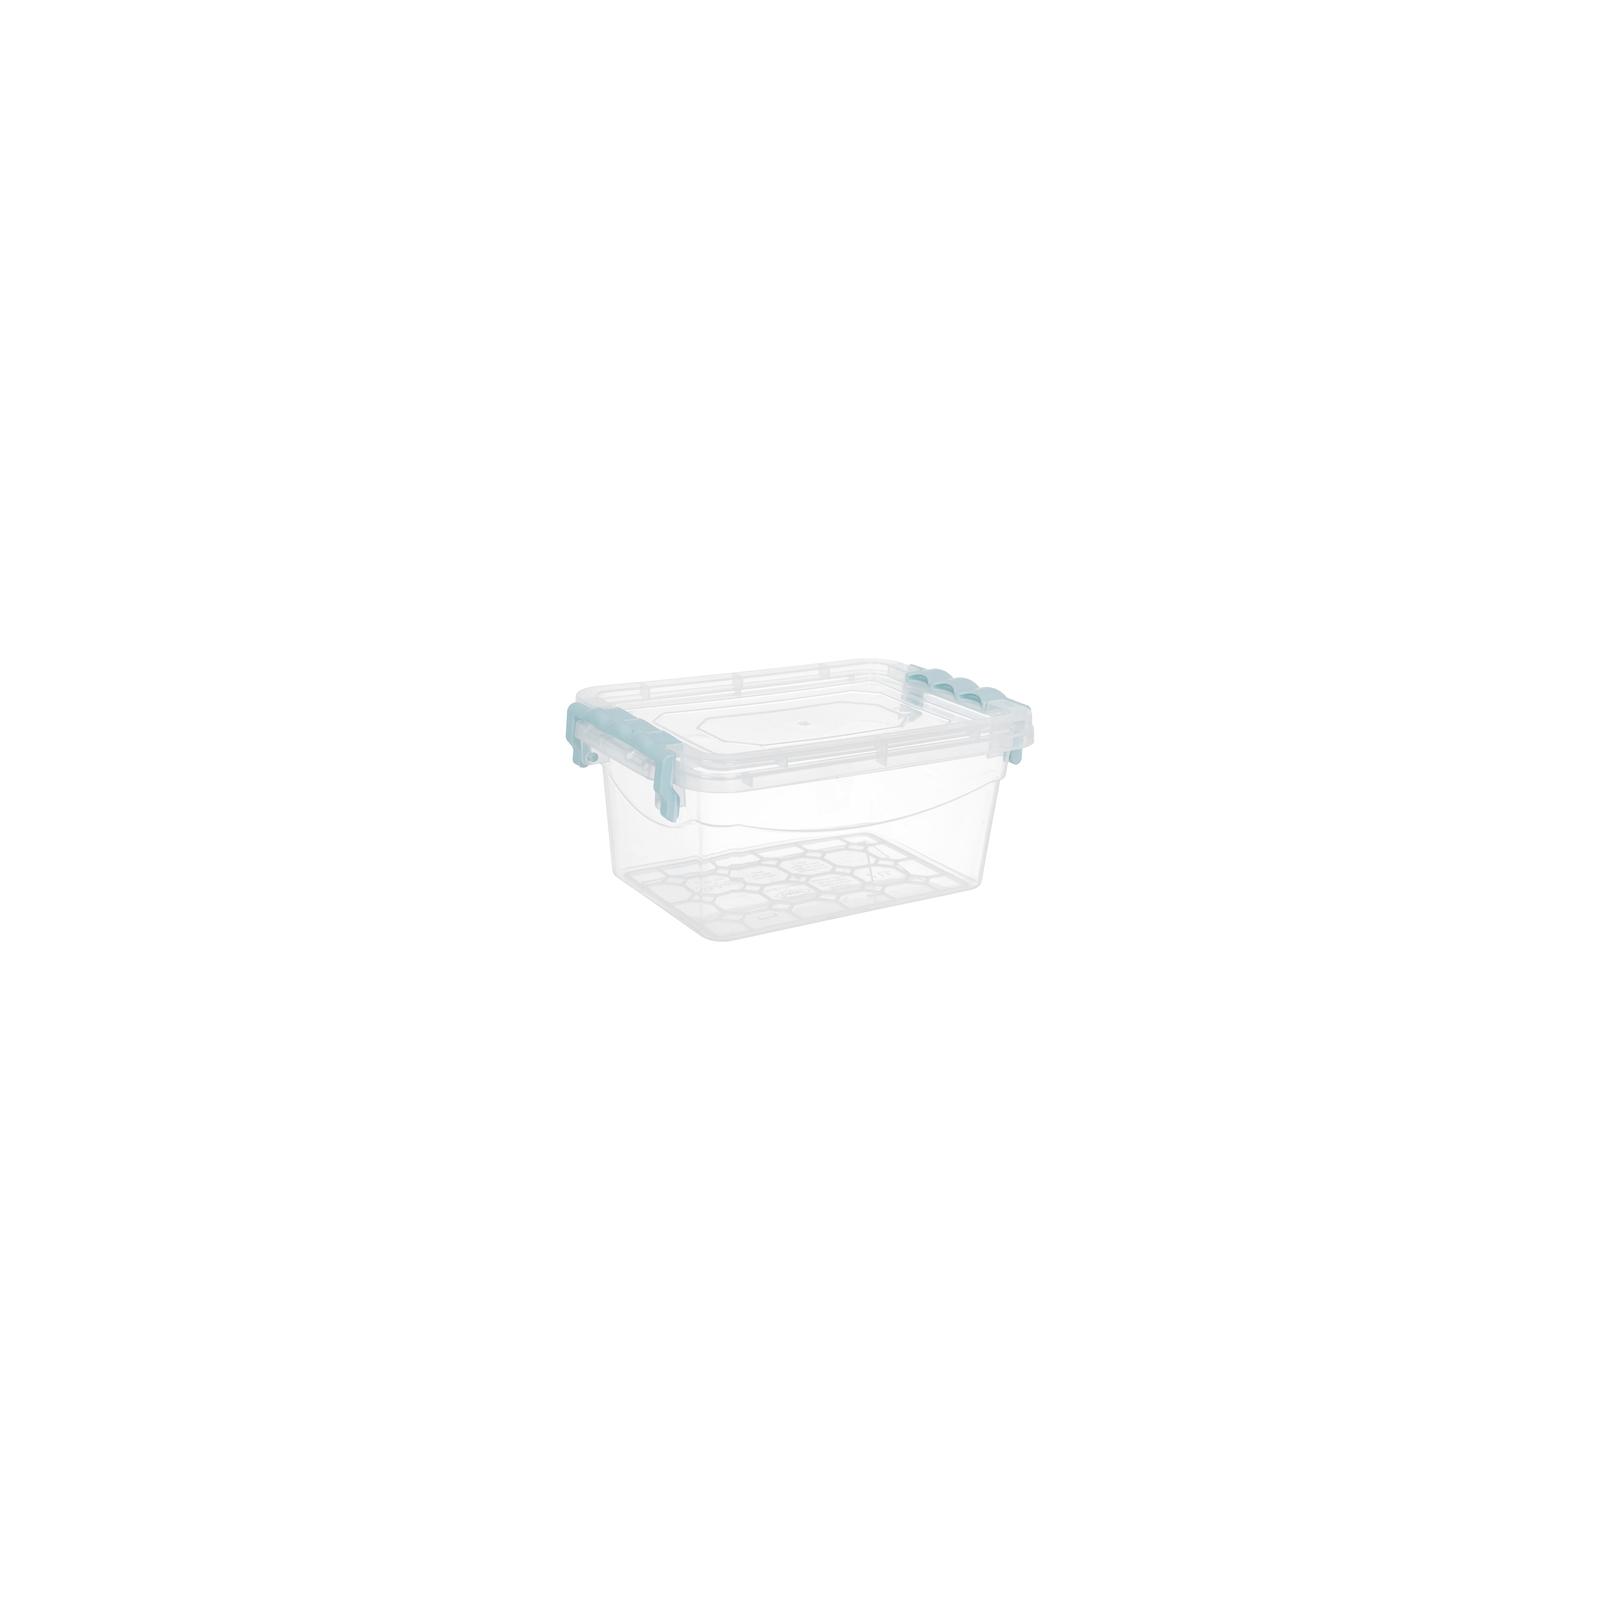 Пищевой контейнер Bager Multi Function 2 л Blue (BG-356 B)